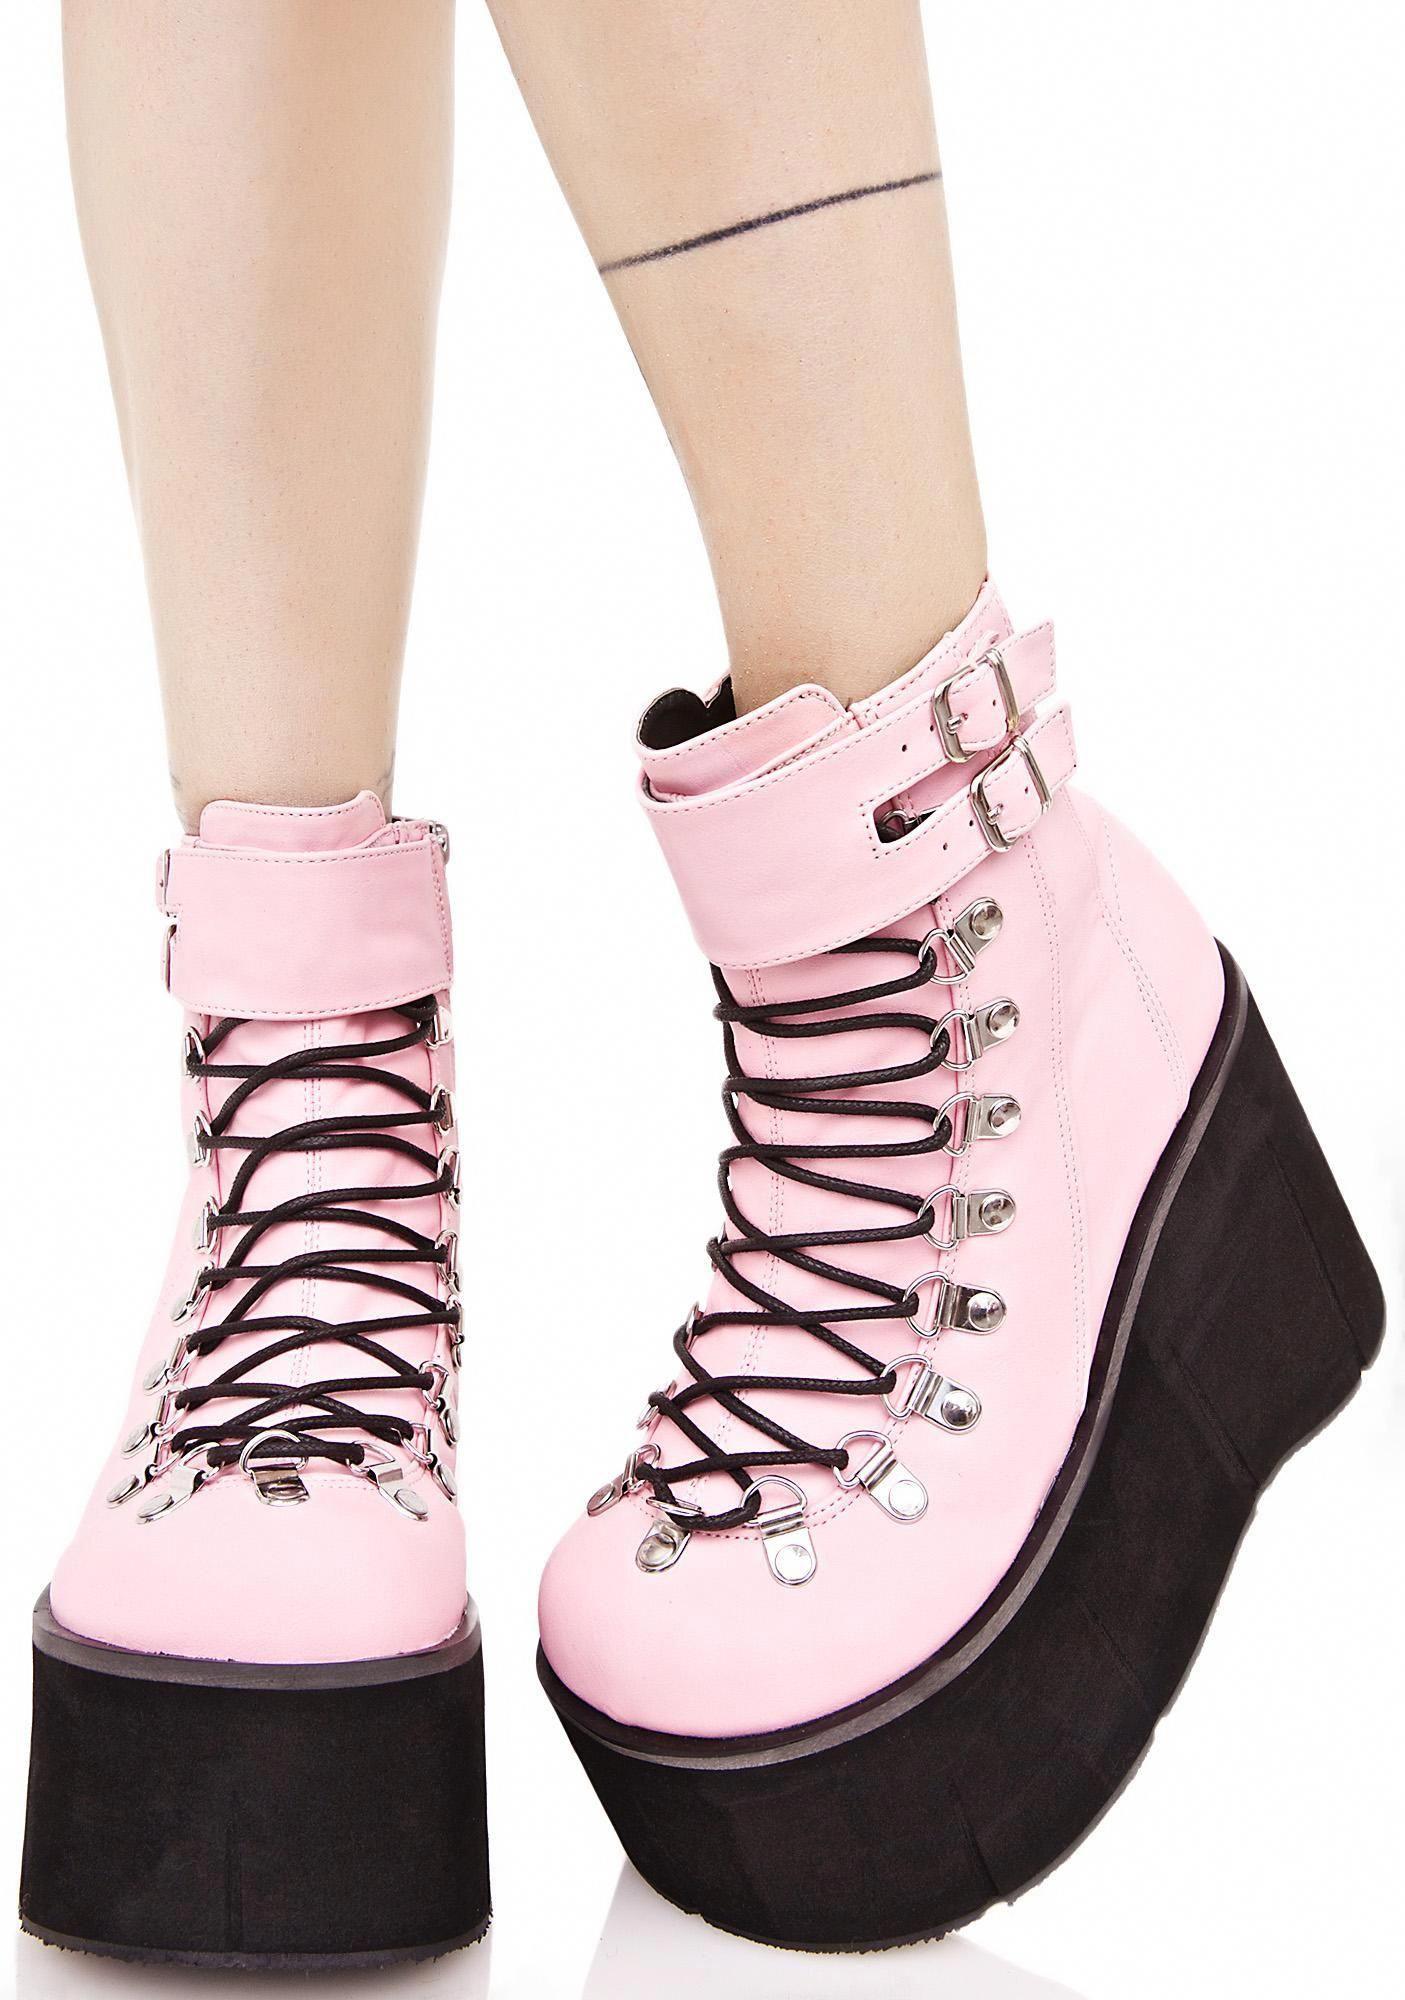 d13f8b9bf3 Kawaii Pastel Goth Platform  boots Demonia Sweetie Kera Lace-Up Platform  Boots